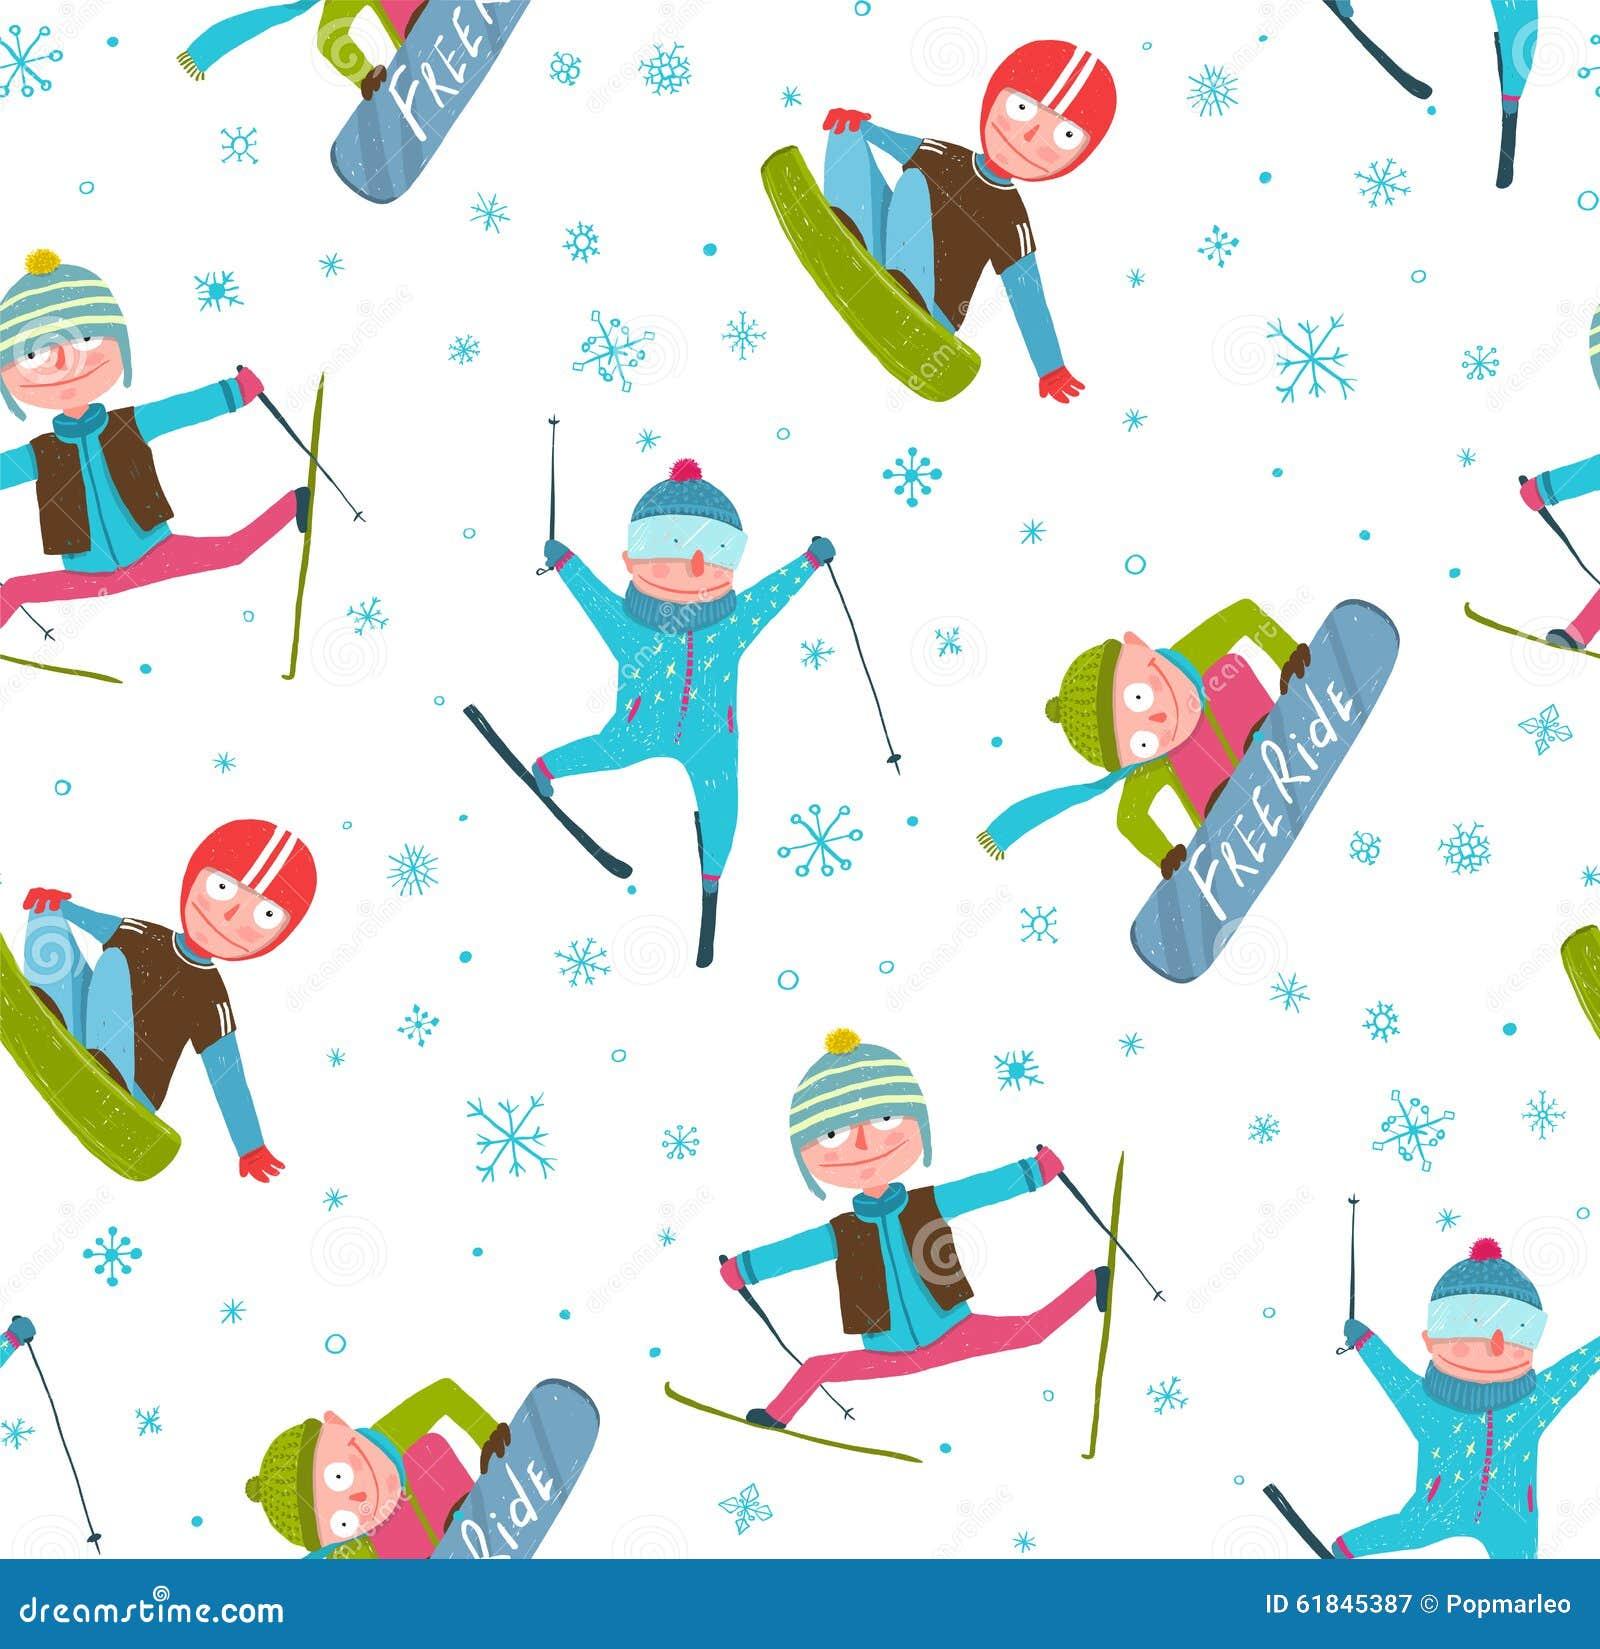 Free Worksheets xl worksheet : Skifahrer-Snowboarder-Winter-Sport-Karikatur Nahtlos ...